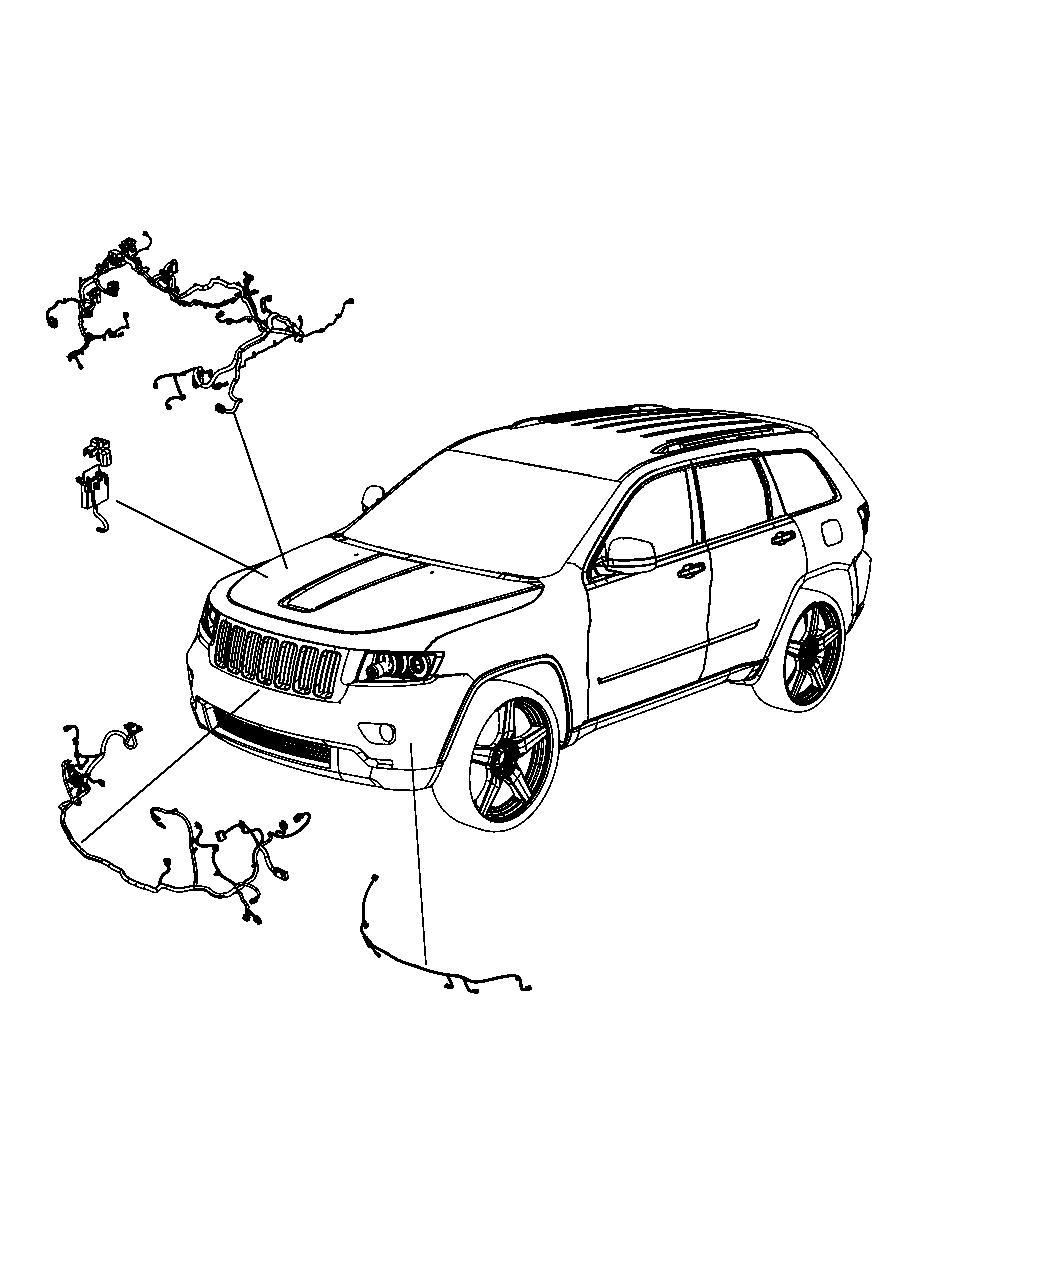 Jeep Grand Cherokee Wiring. Headlamp to dash. Us, canada